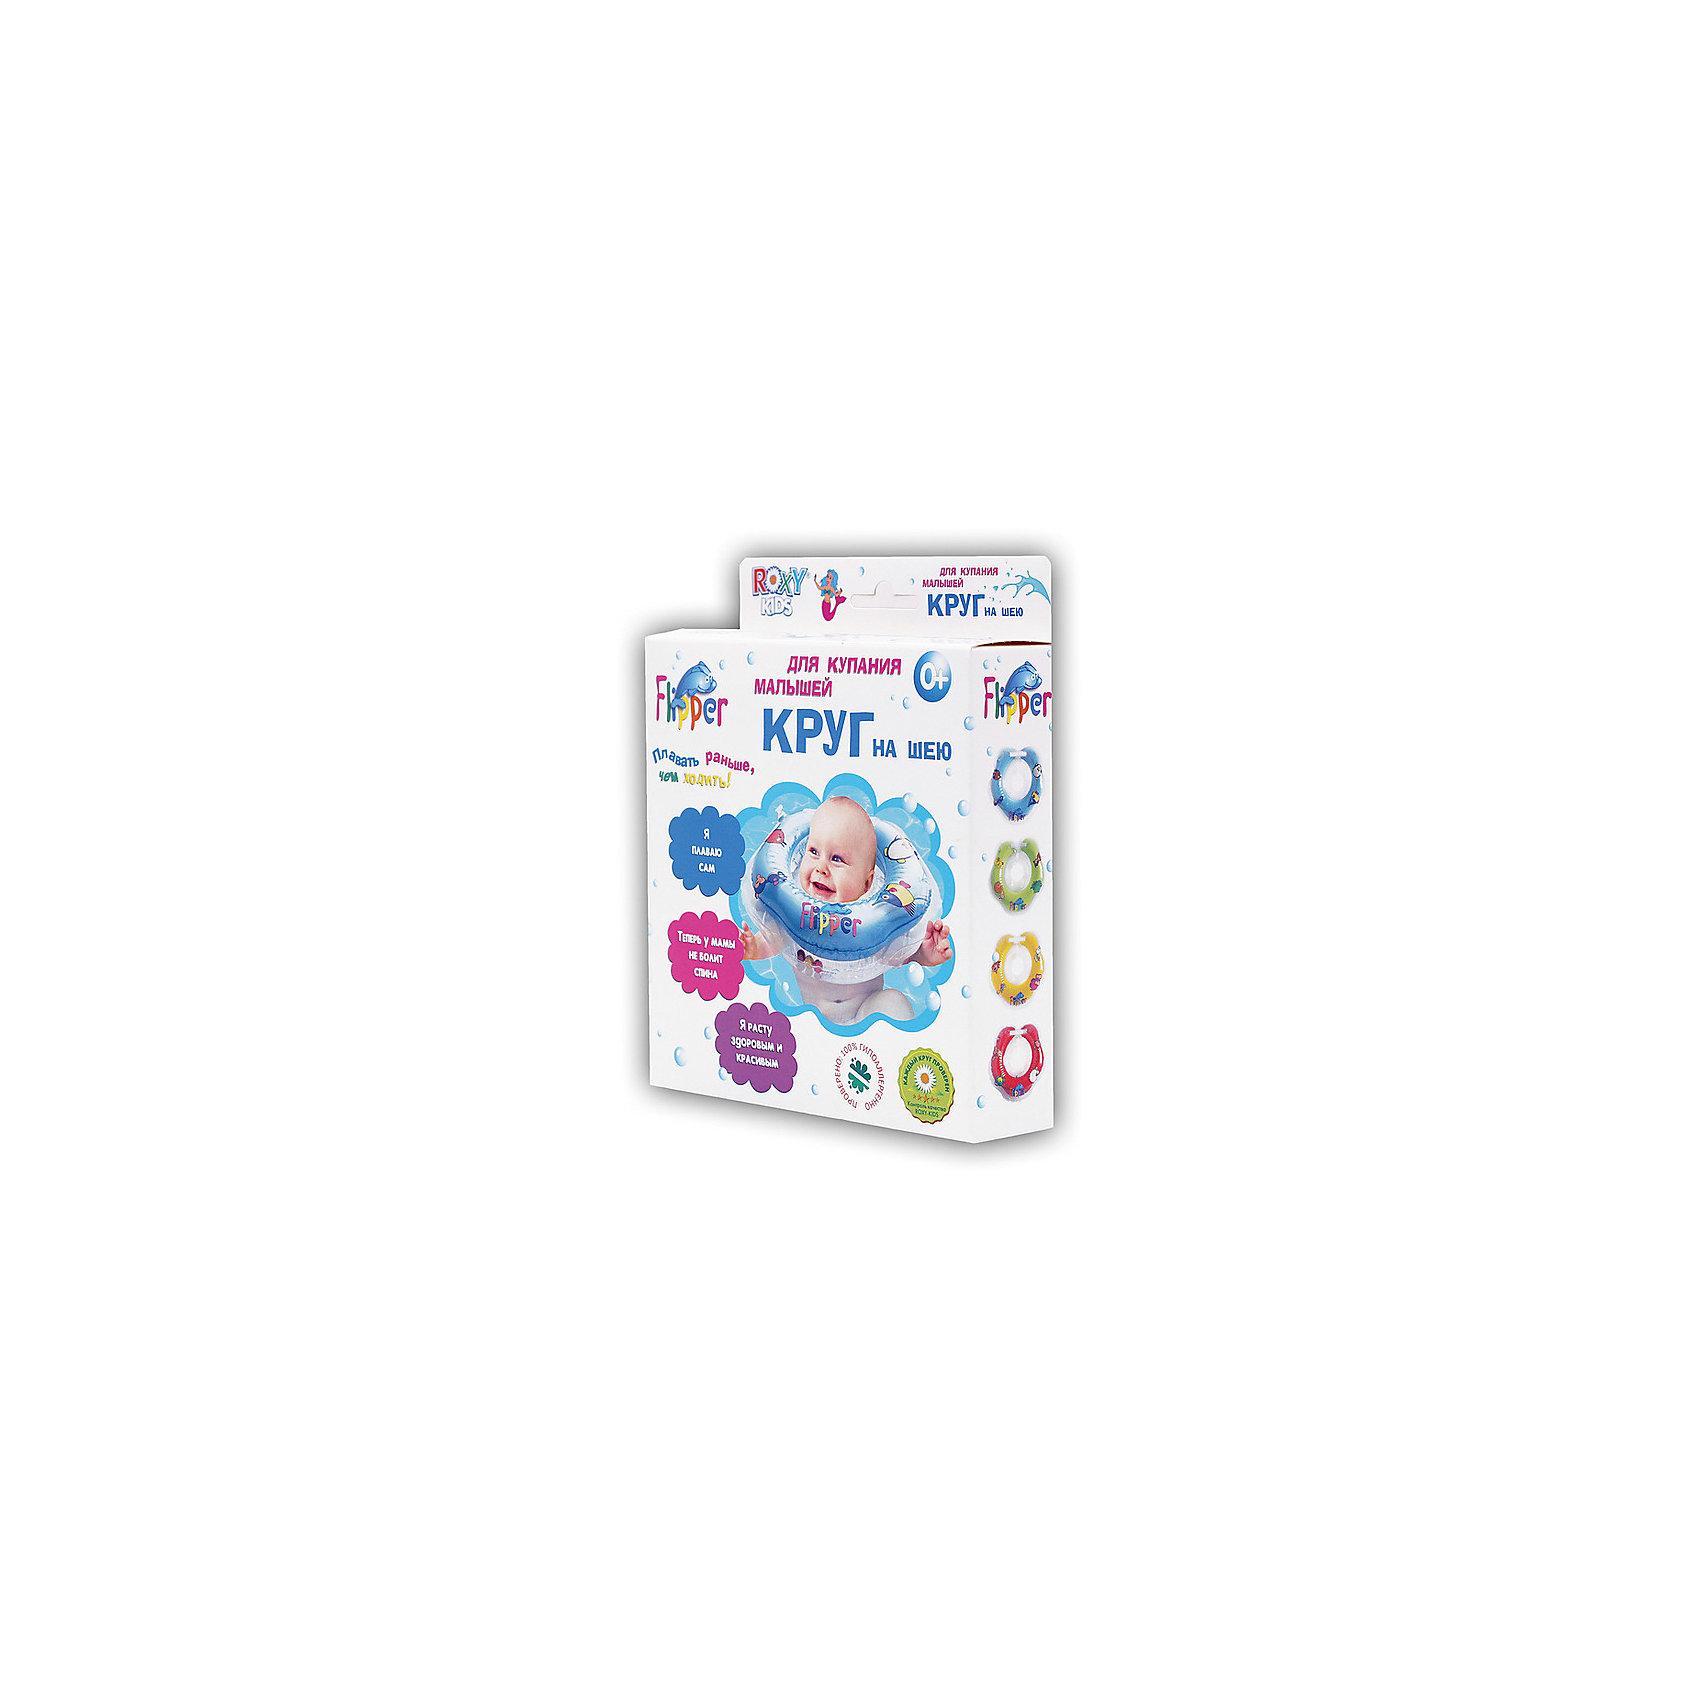 Круг на шею Flipper FL001 для купания малышей 0+, Roxy-Kids, голубой